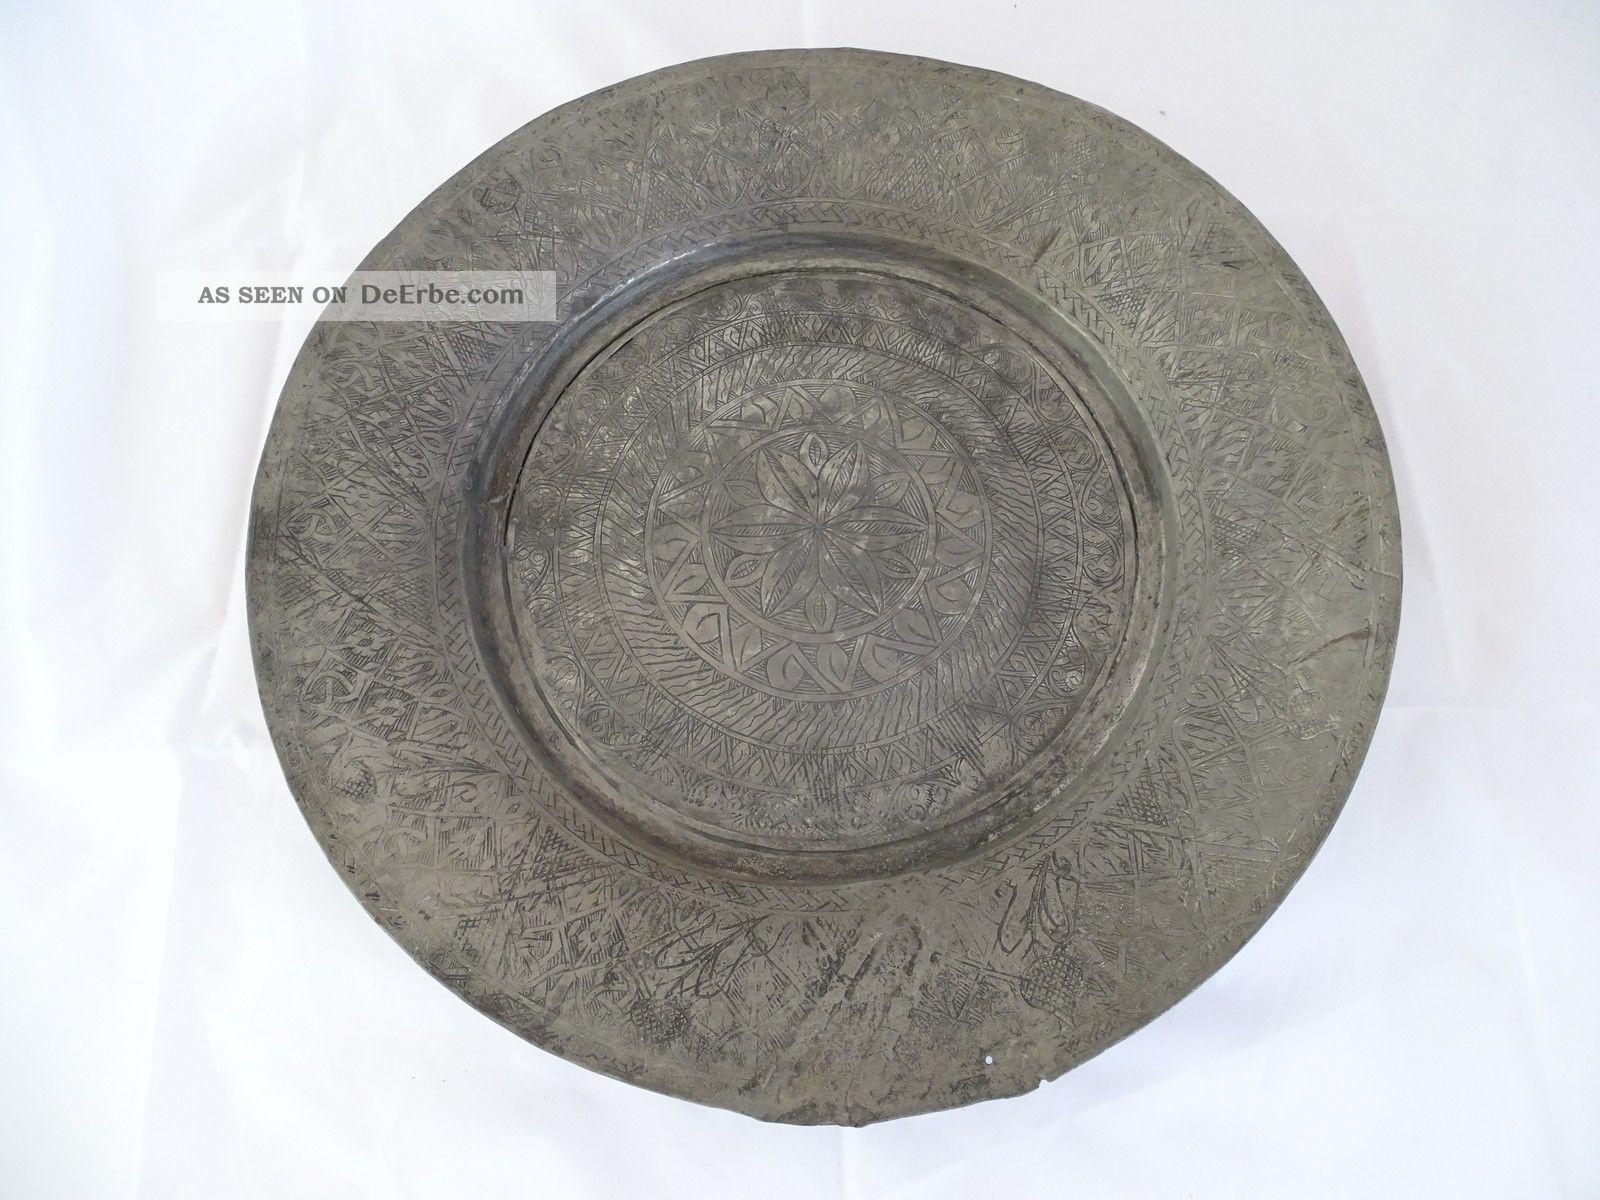 Große Dekorative Antike Orientalische Schale Essschale Großteller 58cm Islamische Kunst Bild